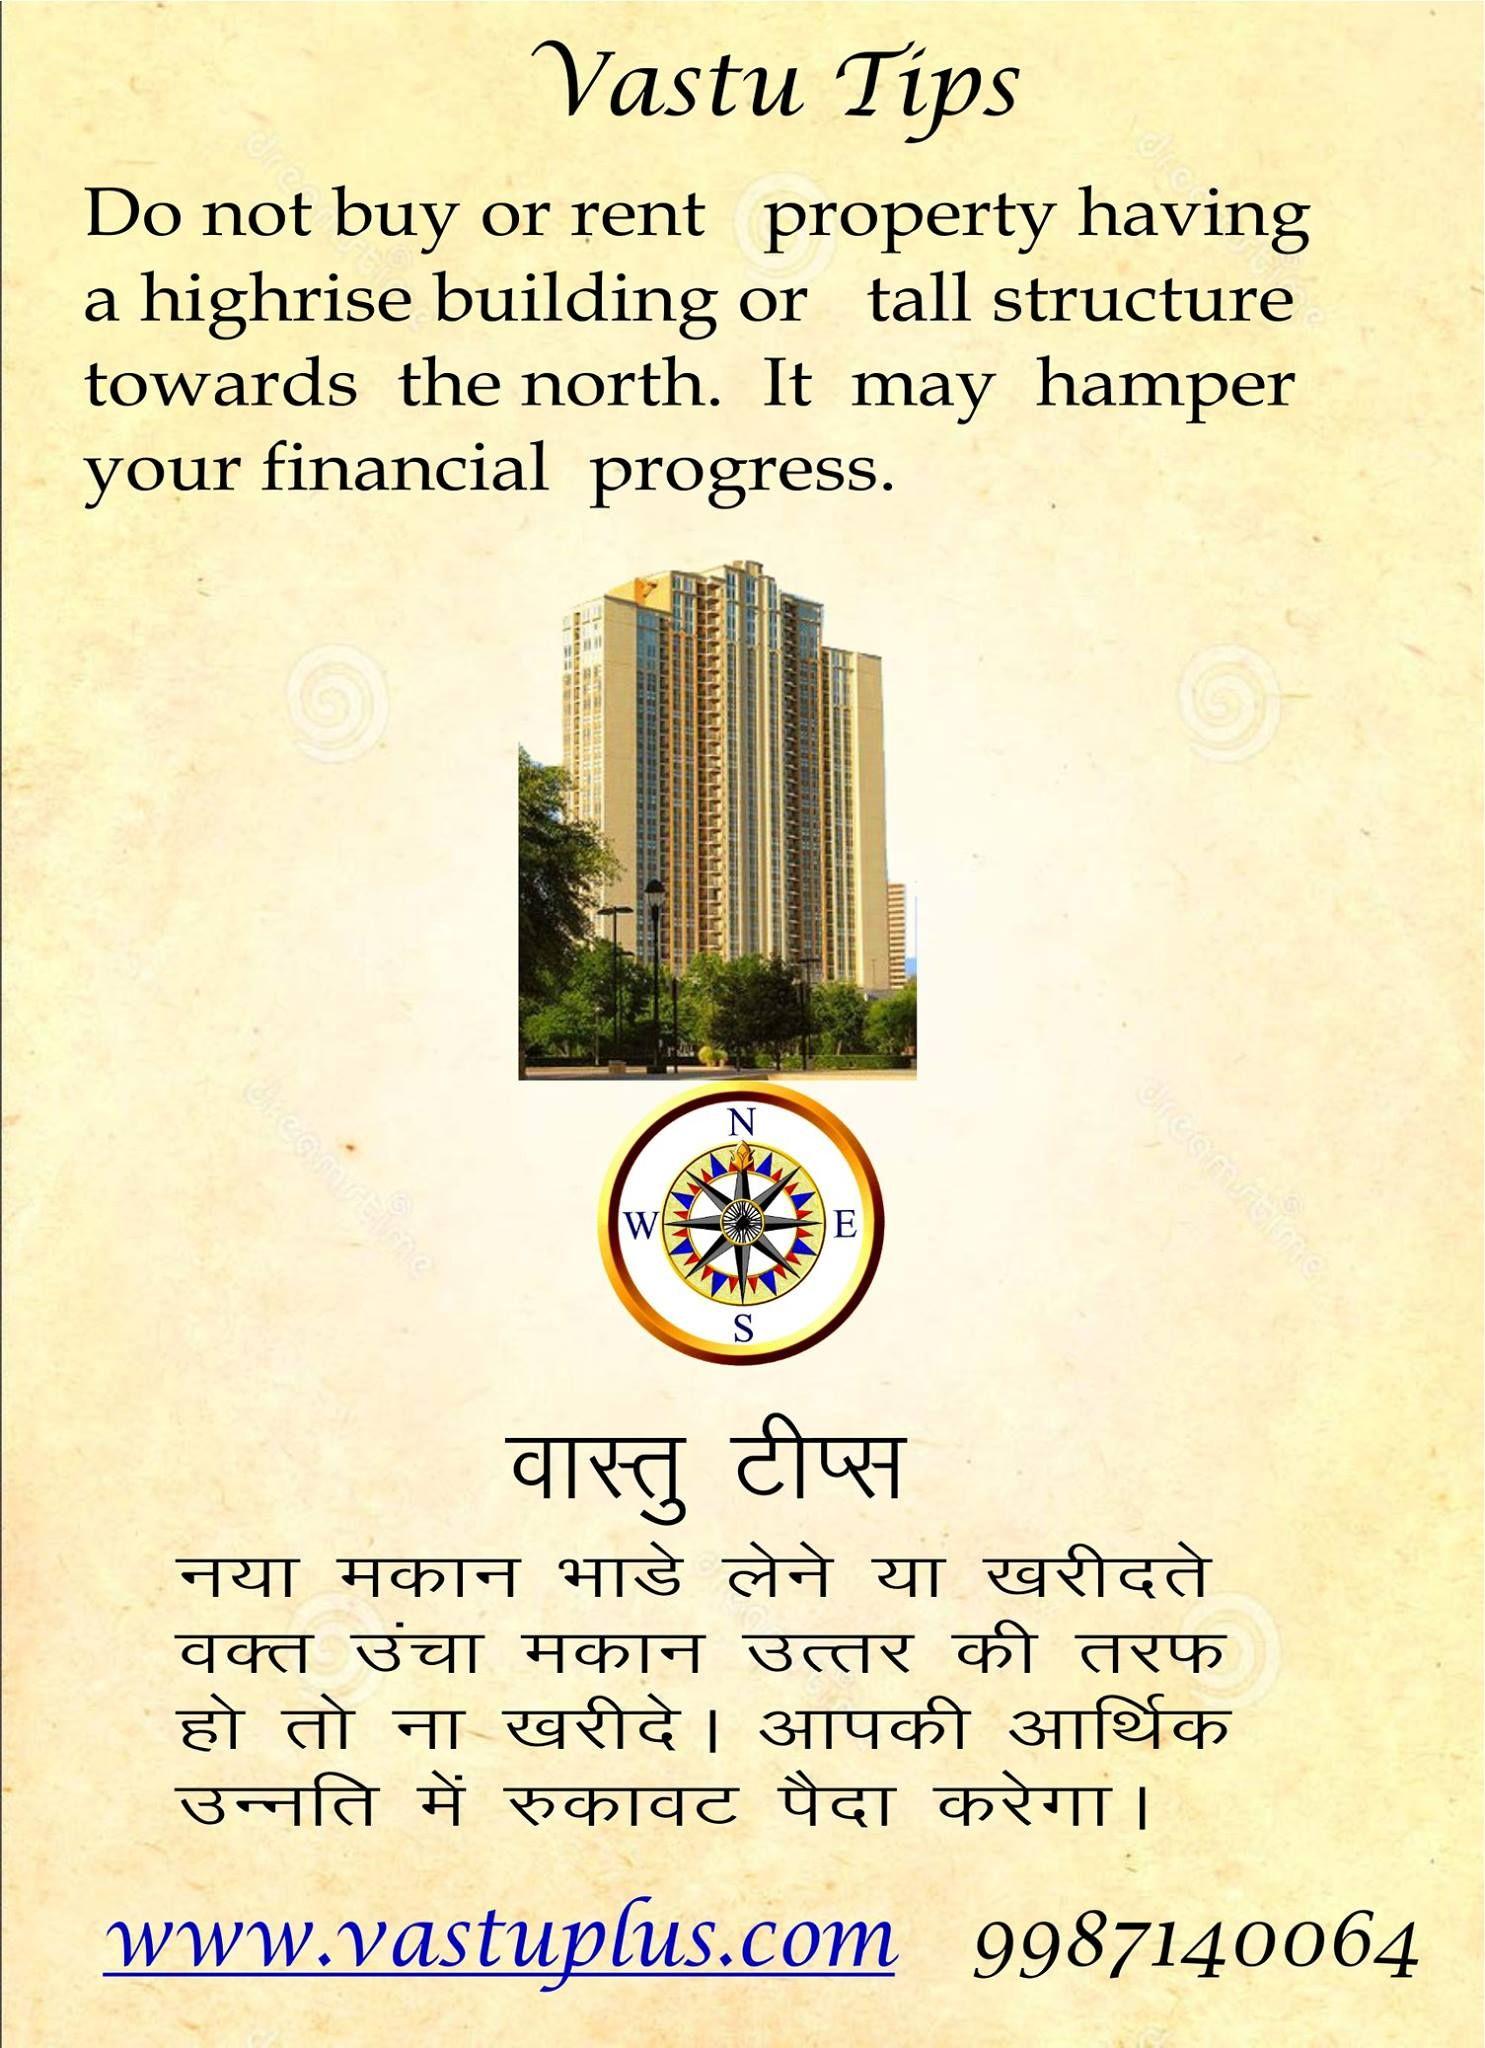 Vastu Tip On Property Surrounding Www Vastuplus Com Vastu